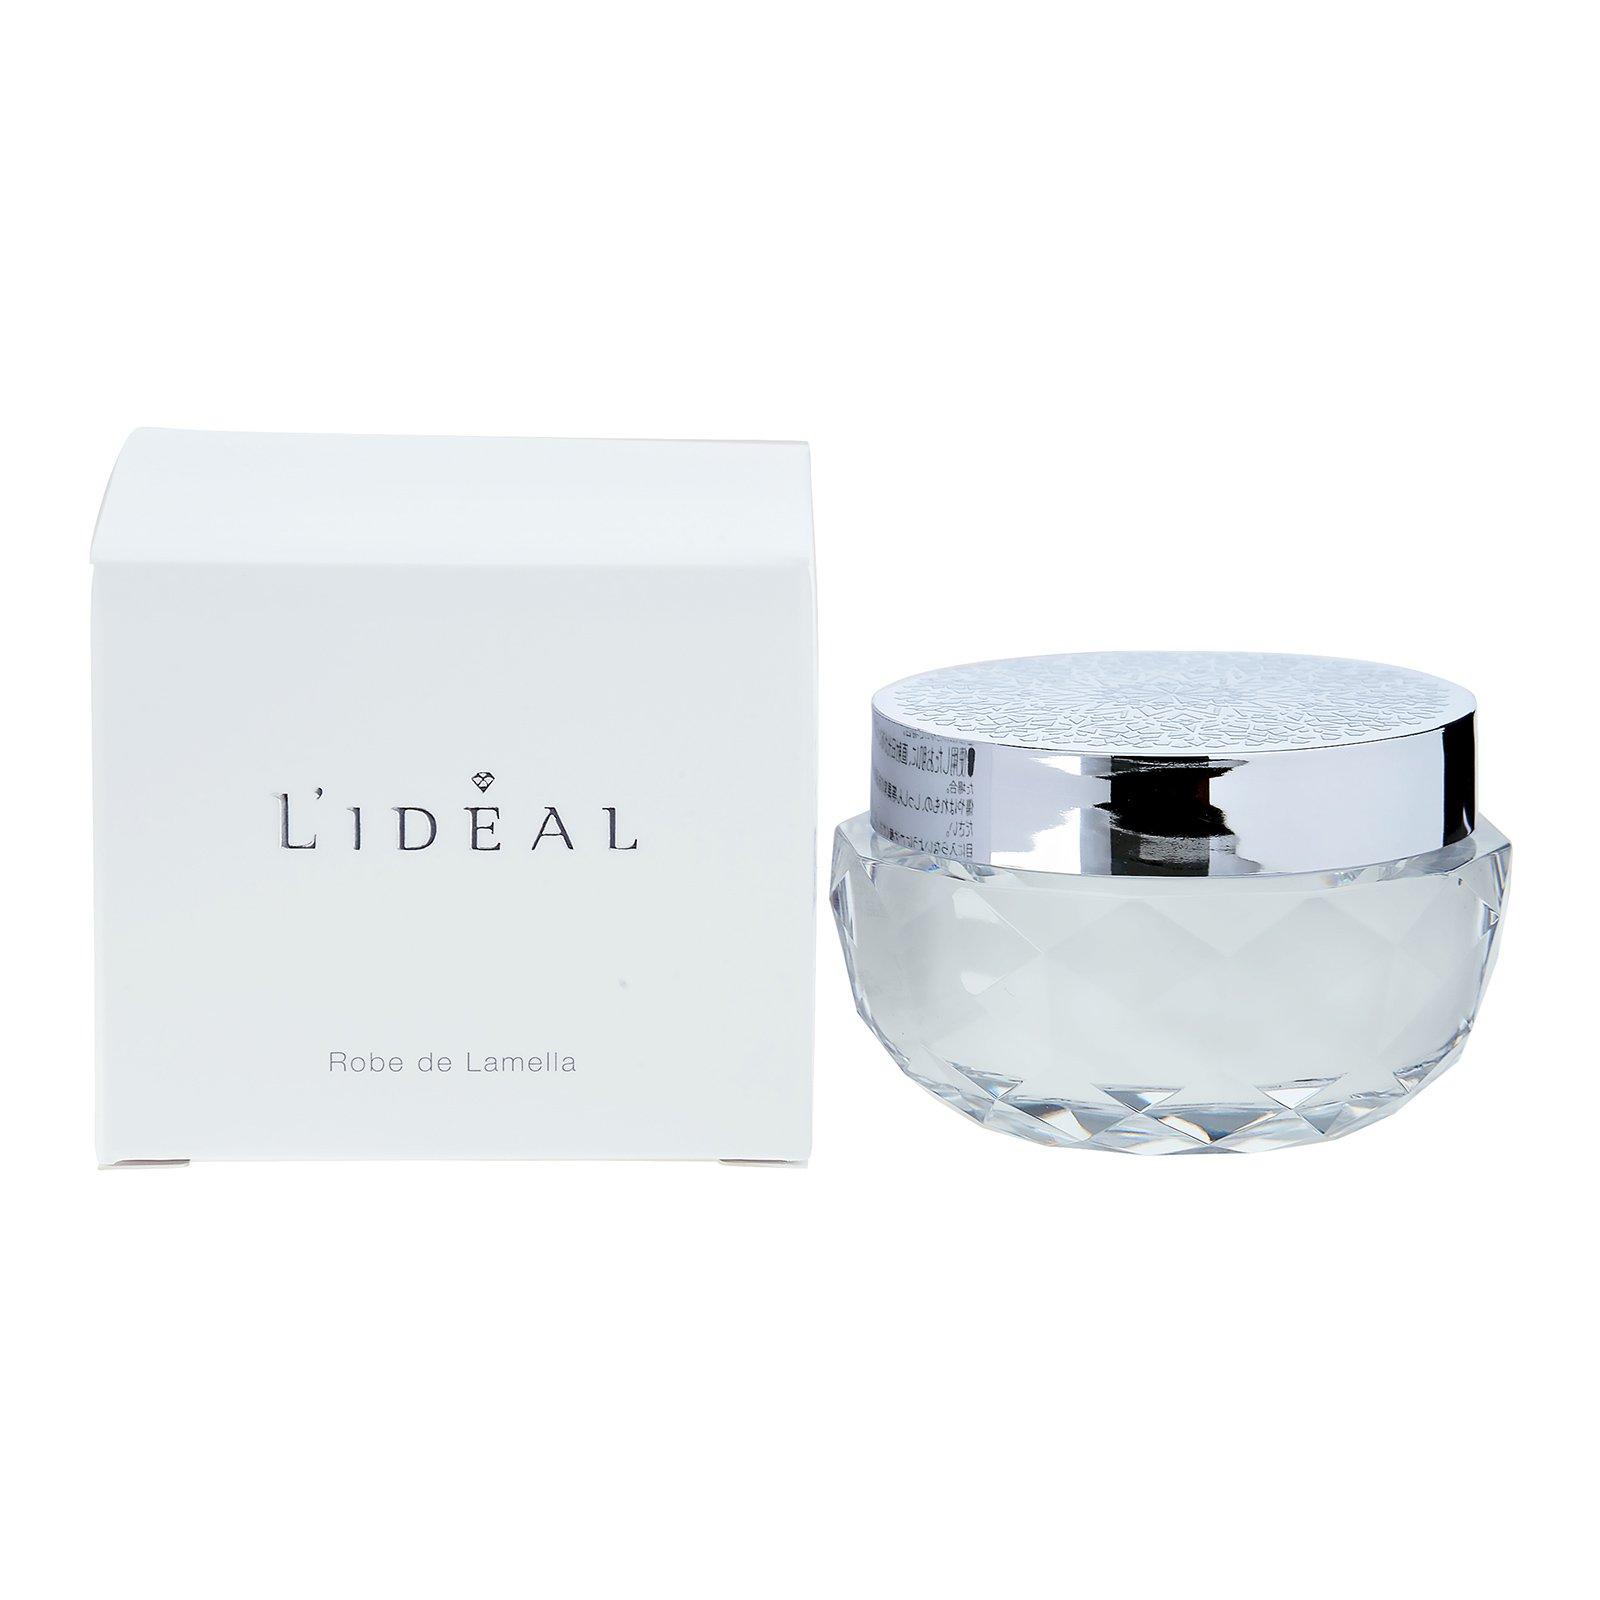 L'Ideal  Robe de Lamella (Wrinkle-Free Anti-Aging Cream) 30g,